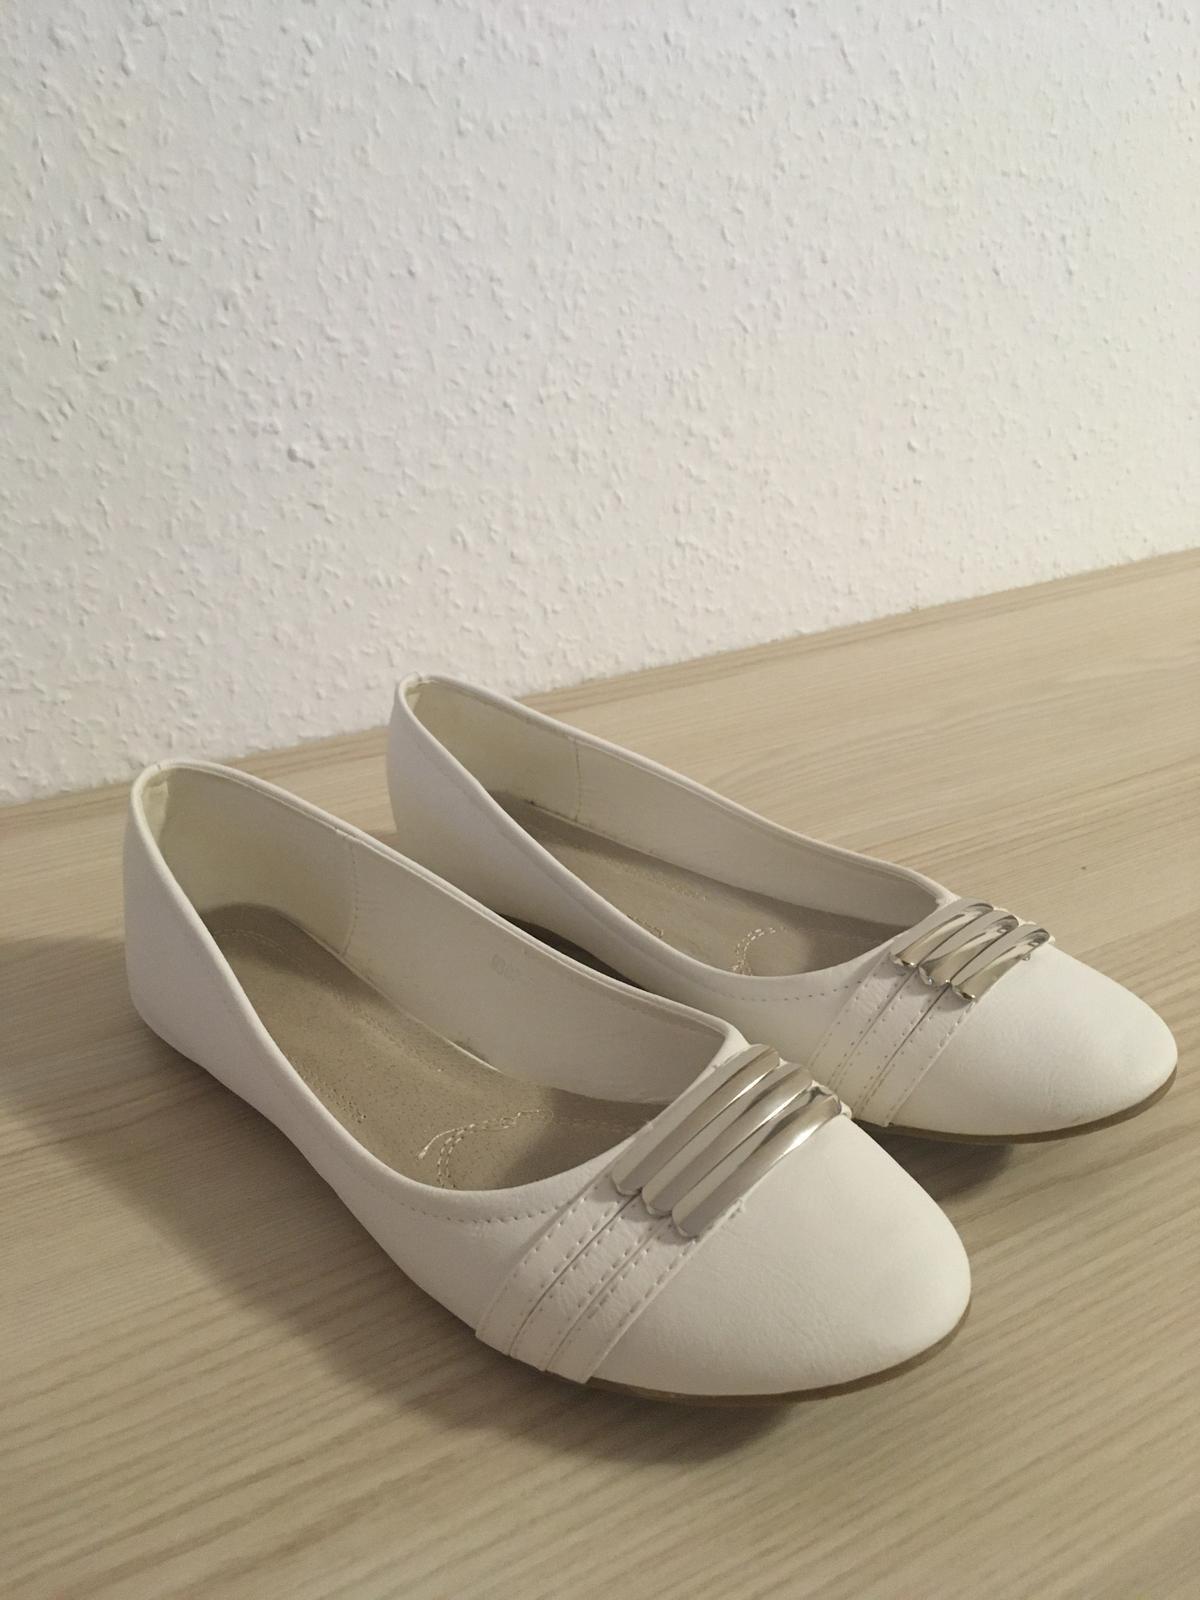 Bílé baleríny 39/40 - Obrázek č. 1